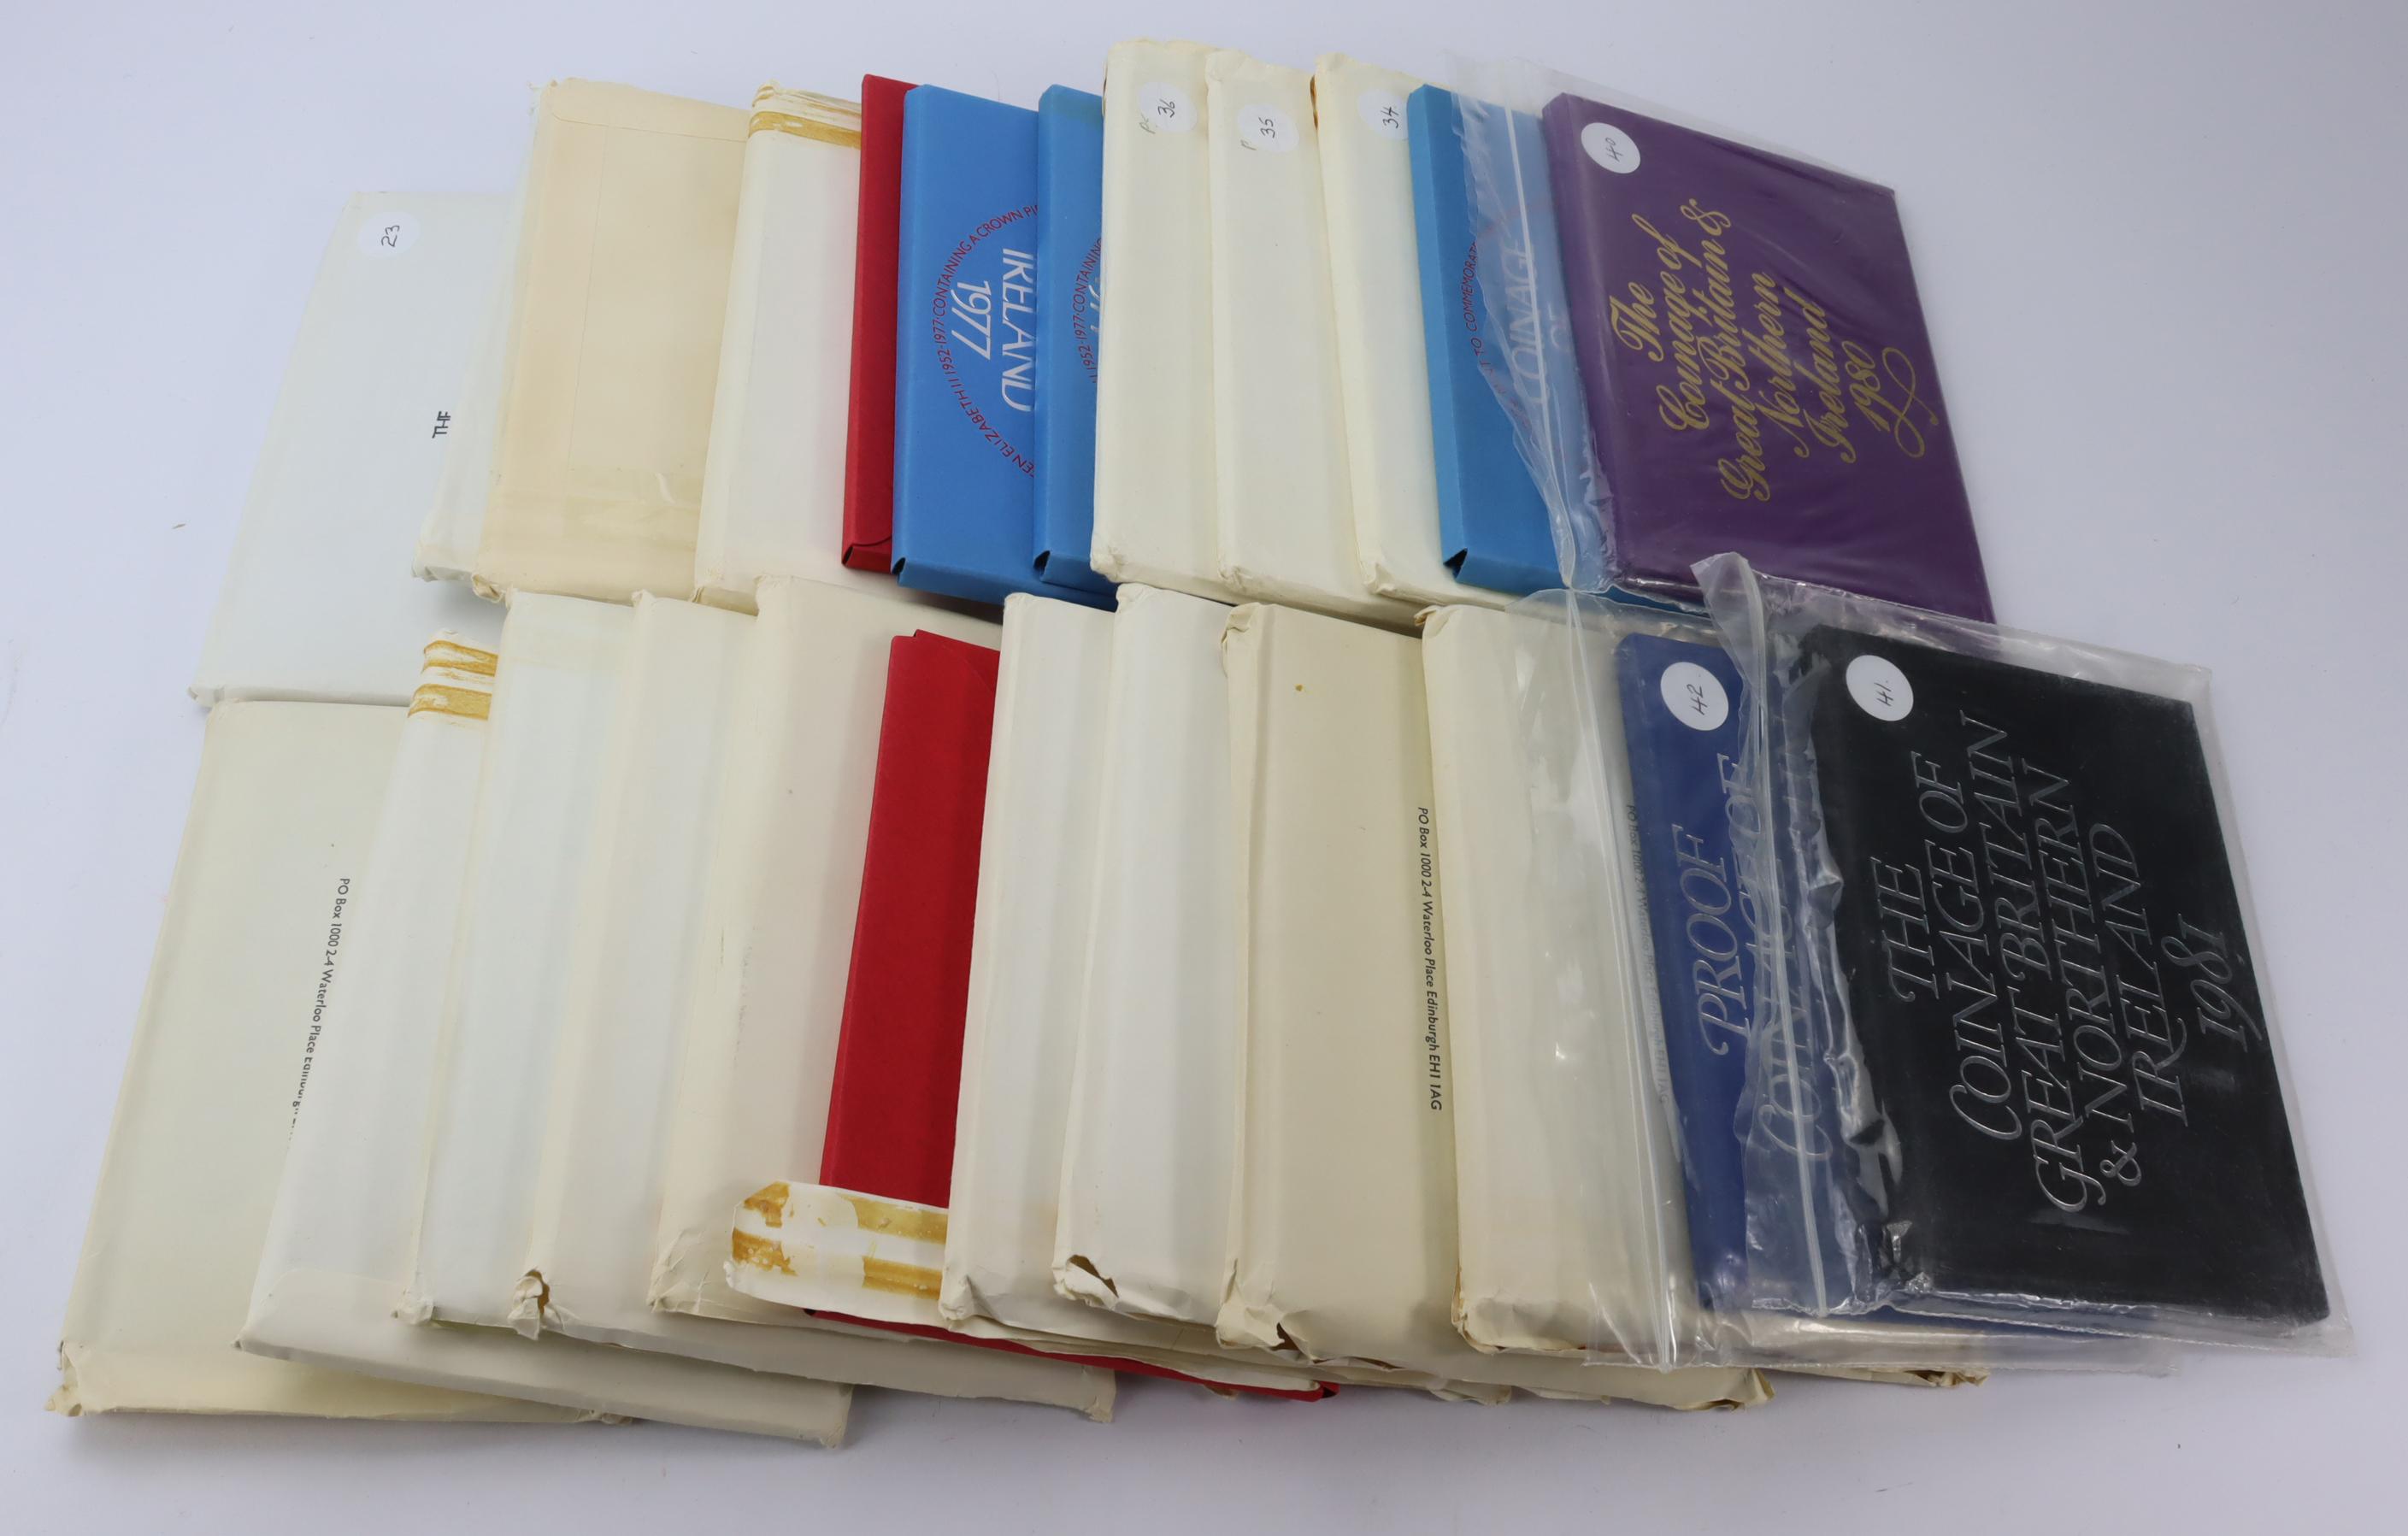 GB Proof Sets (24) all flat packs. 1970x3, 71x3, 72x2, 73x2, 74x2, 75, 76x2, 77x6, 80, 81 & 1982.